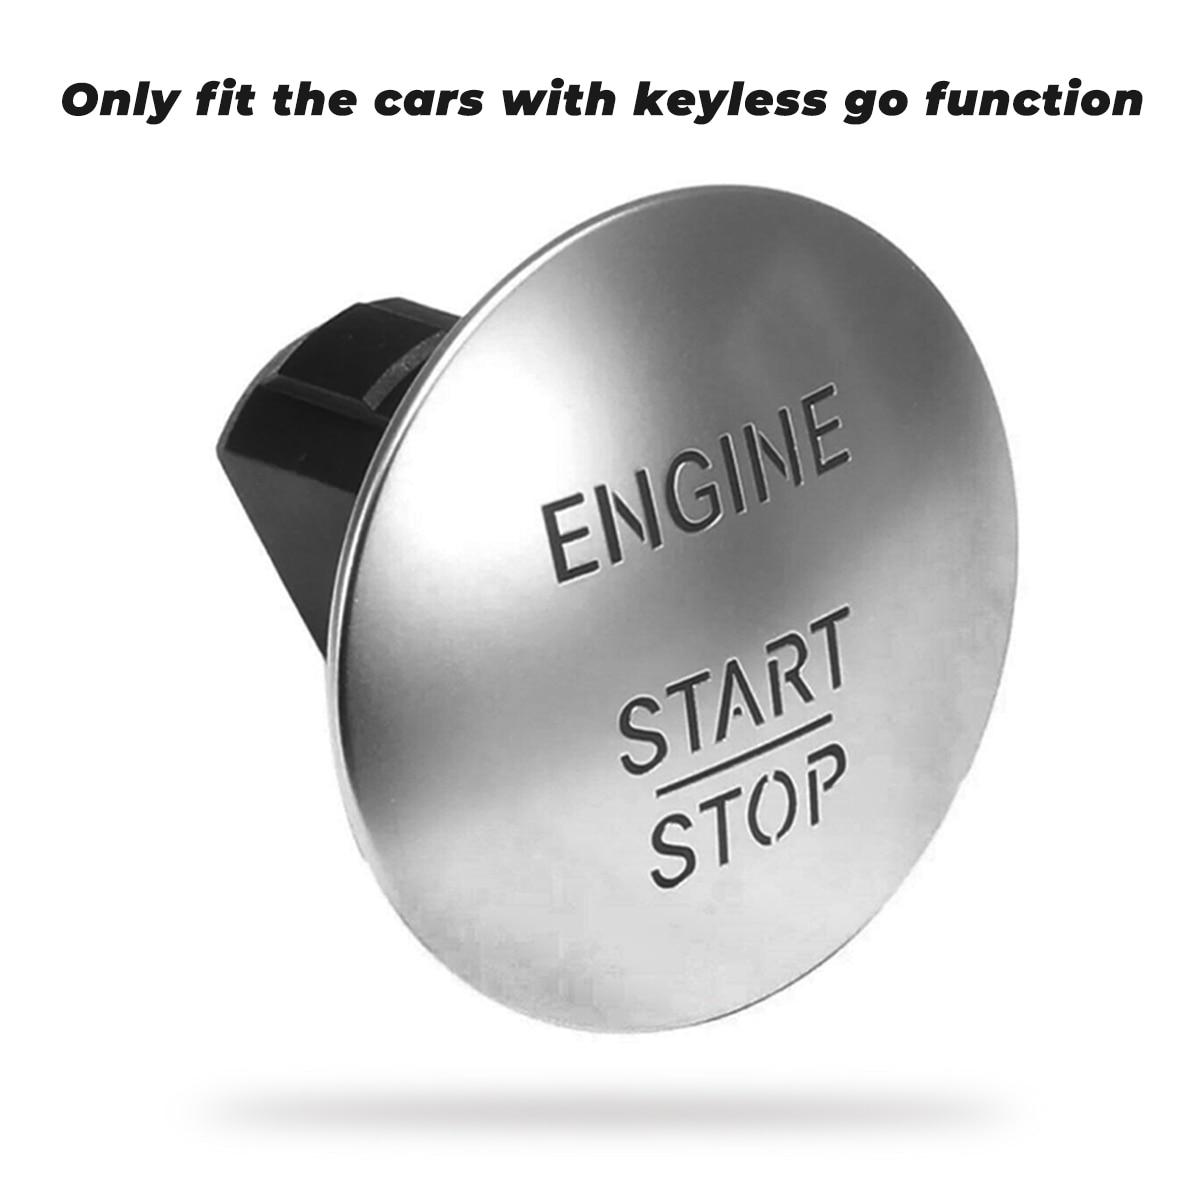 Двигатель lgnition кнопка старт/стоп переключатель для Mercedes Benz W164 W251 W204 205 W221 нажатием одной кнопки Пуск кнопки без ключа